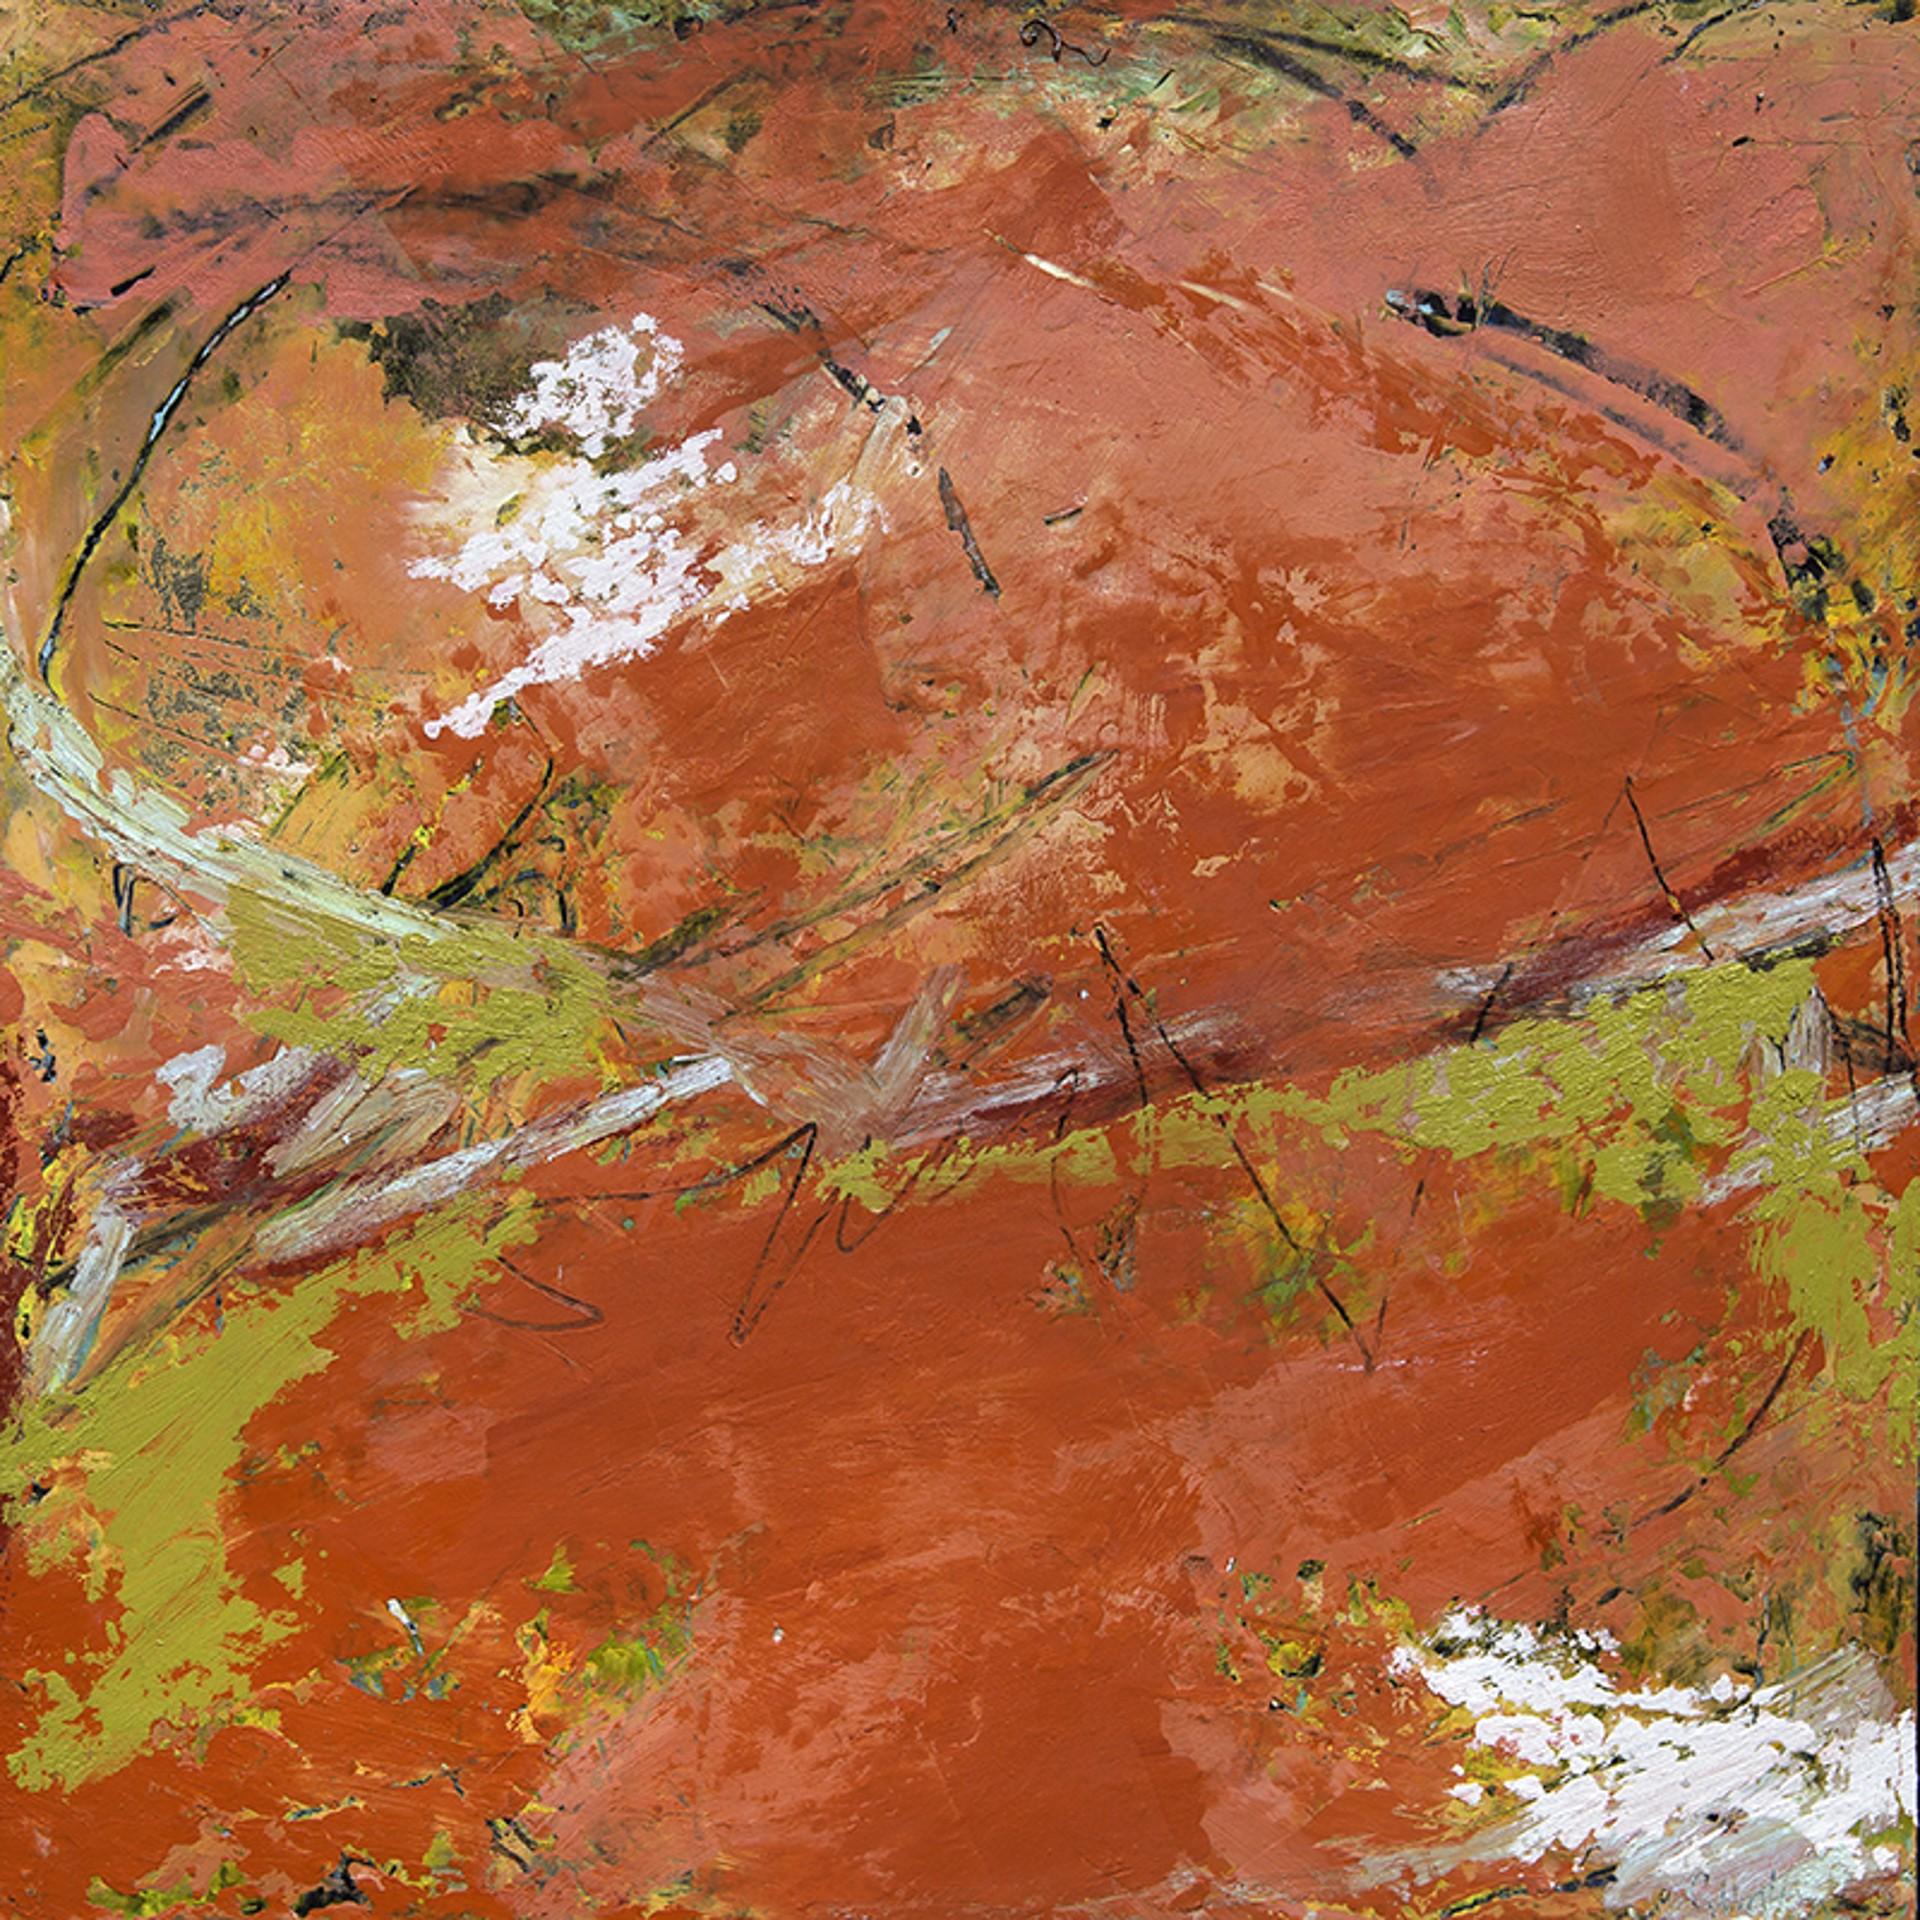 Sky Meets Earth (Coral 1) by Cindy Walton